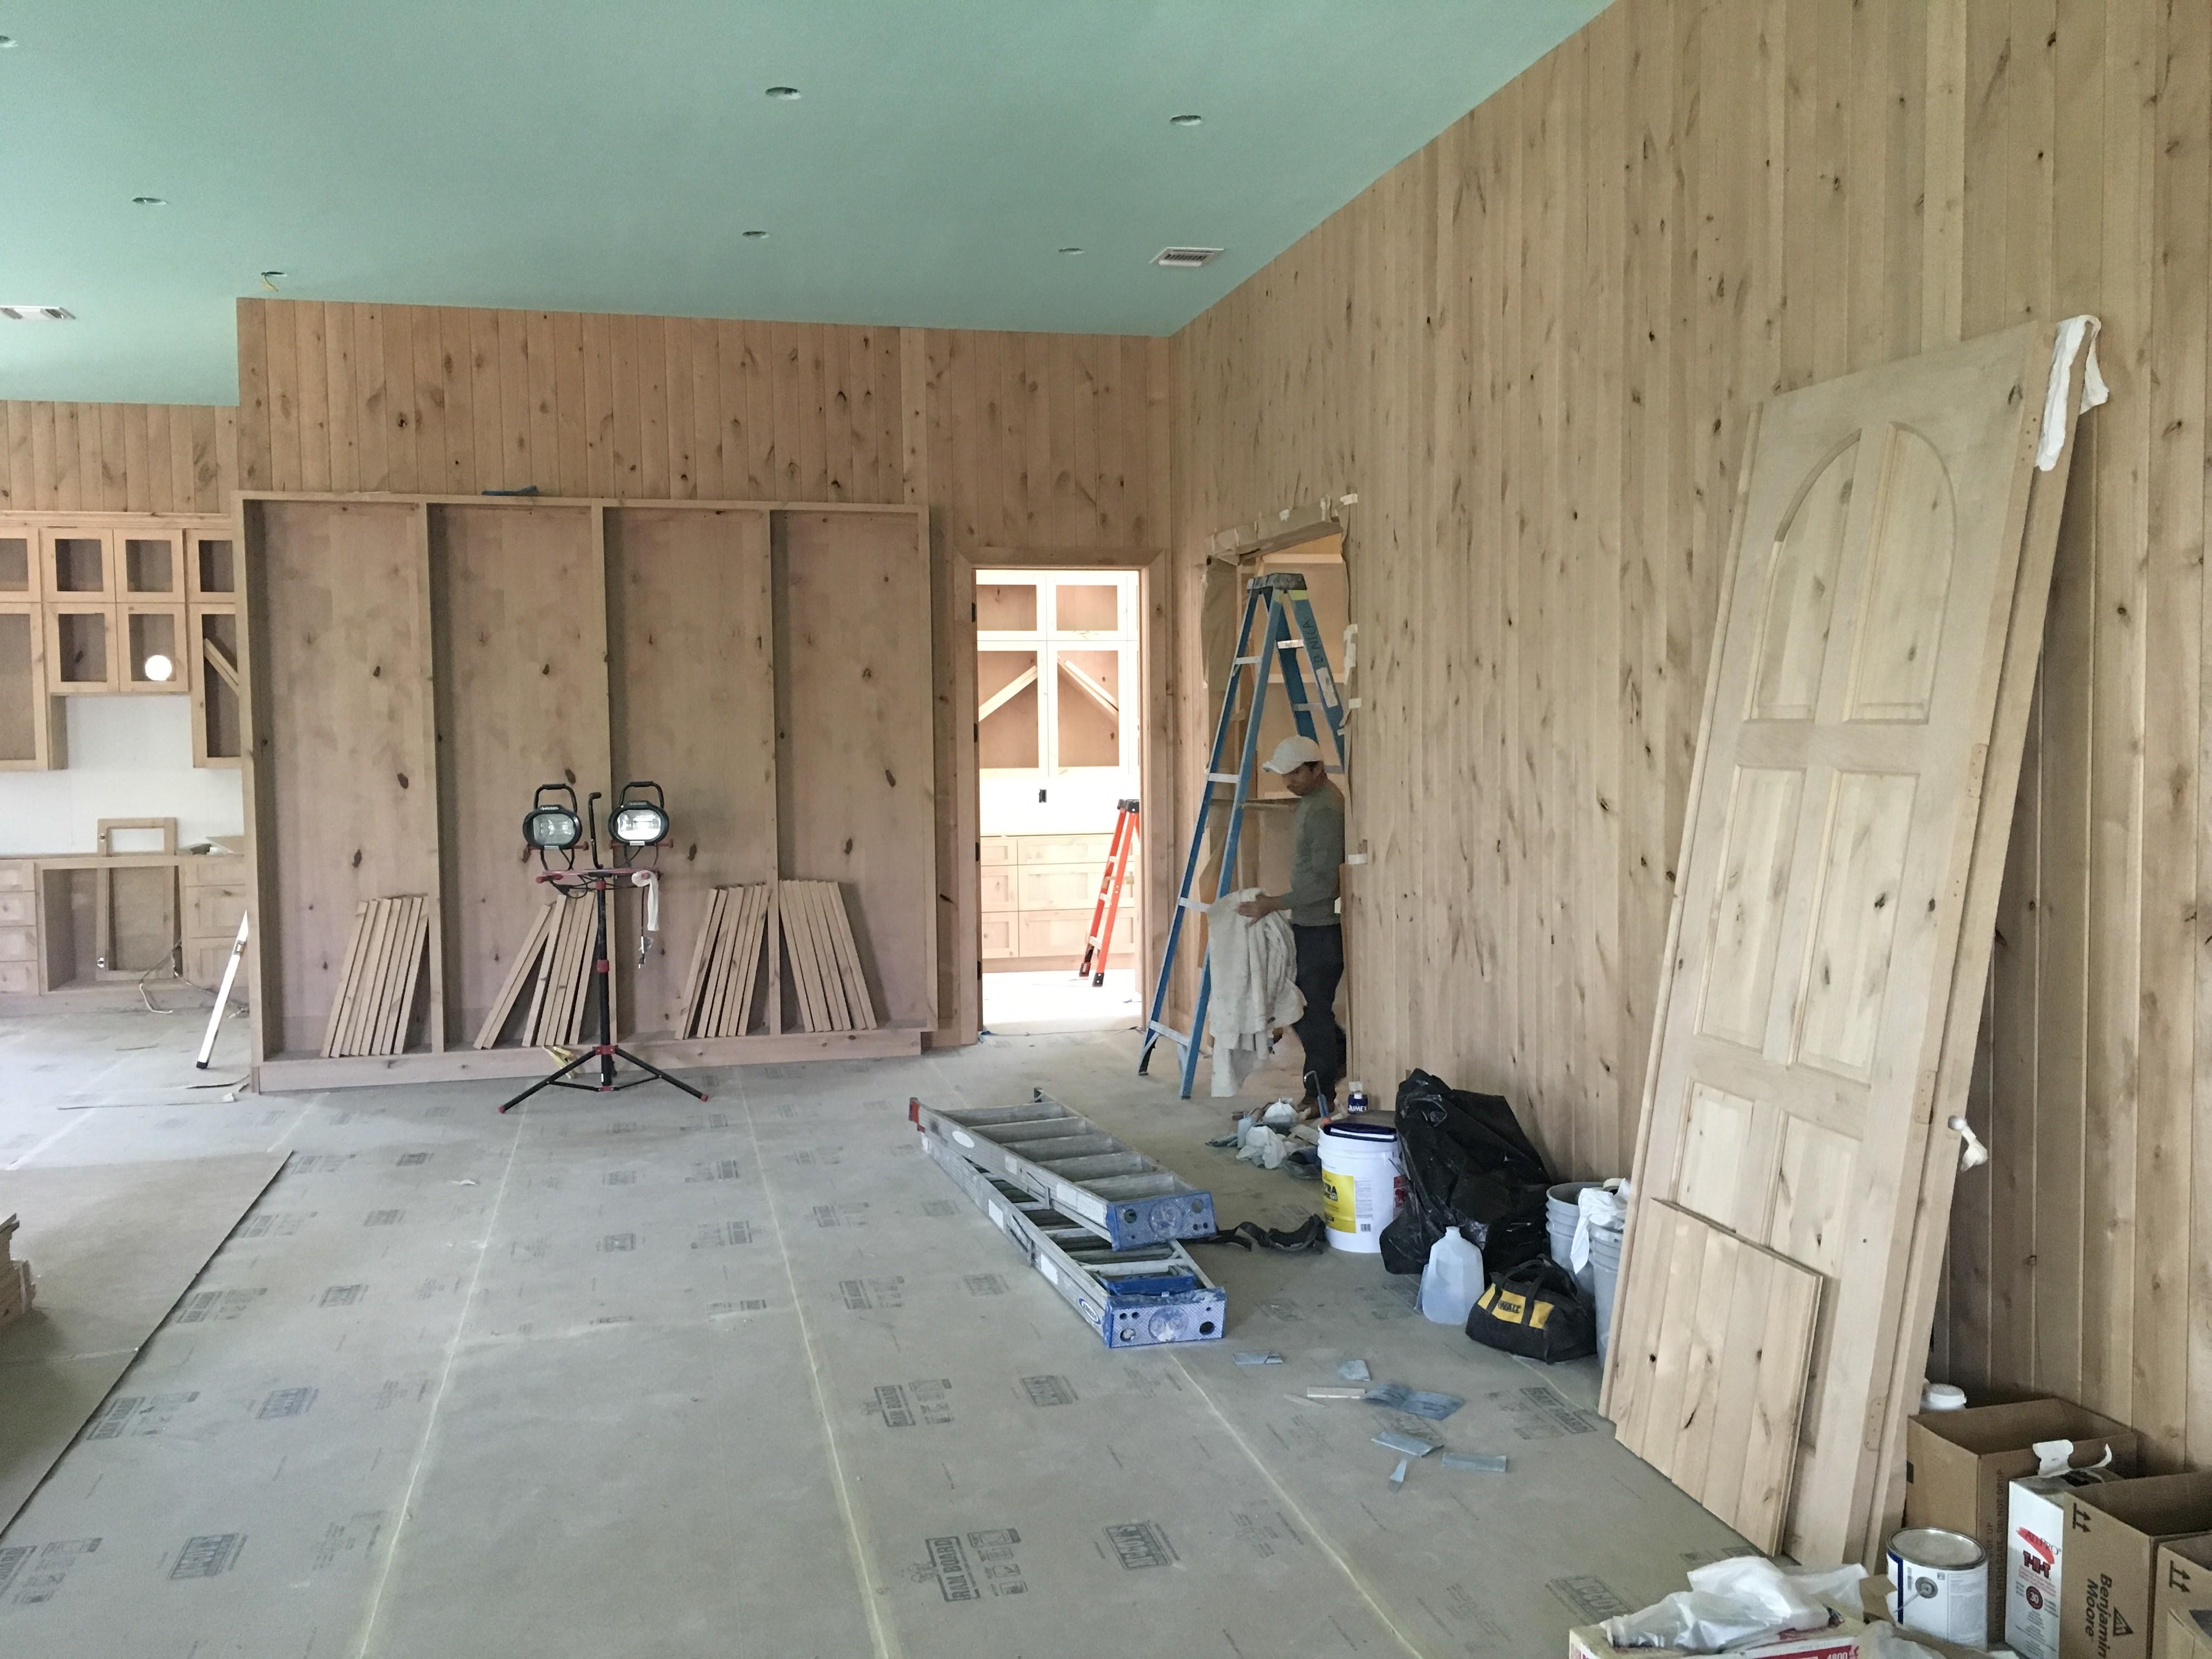 Studio wall paneling/shelves